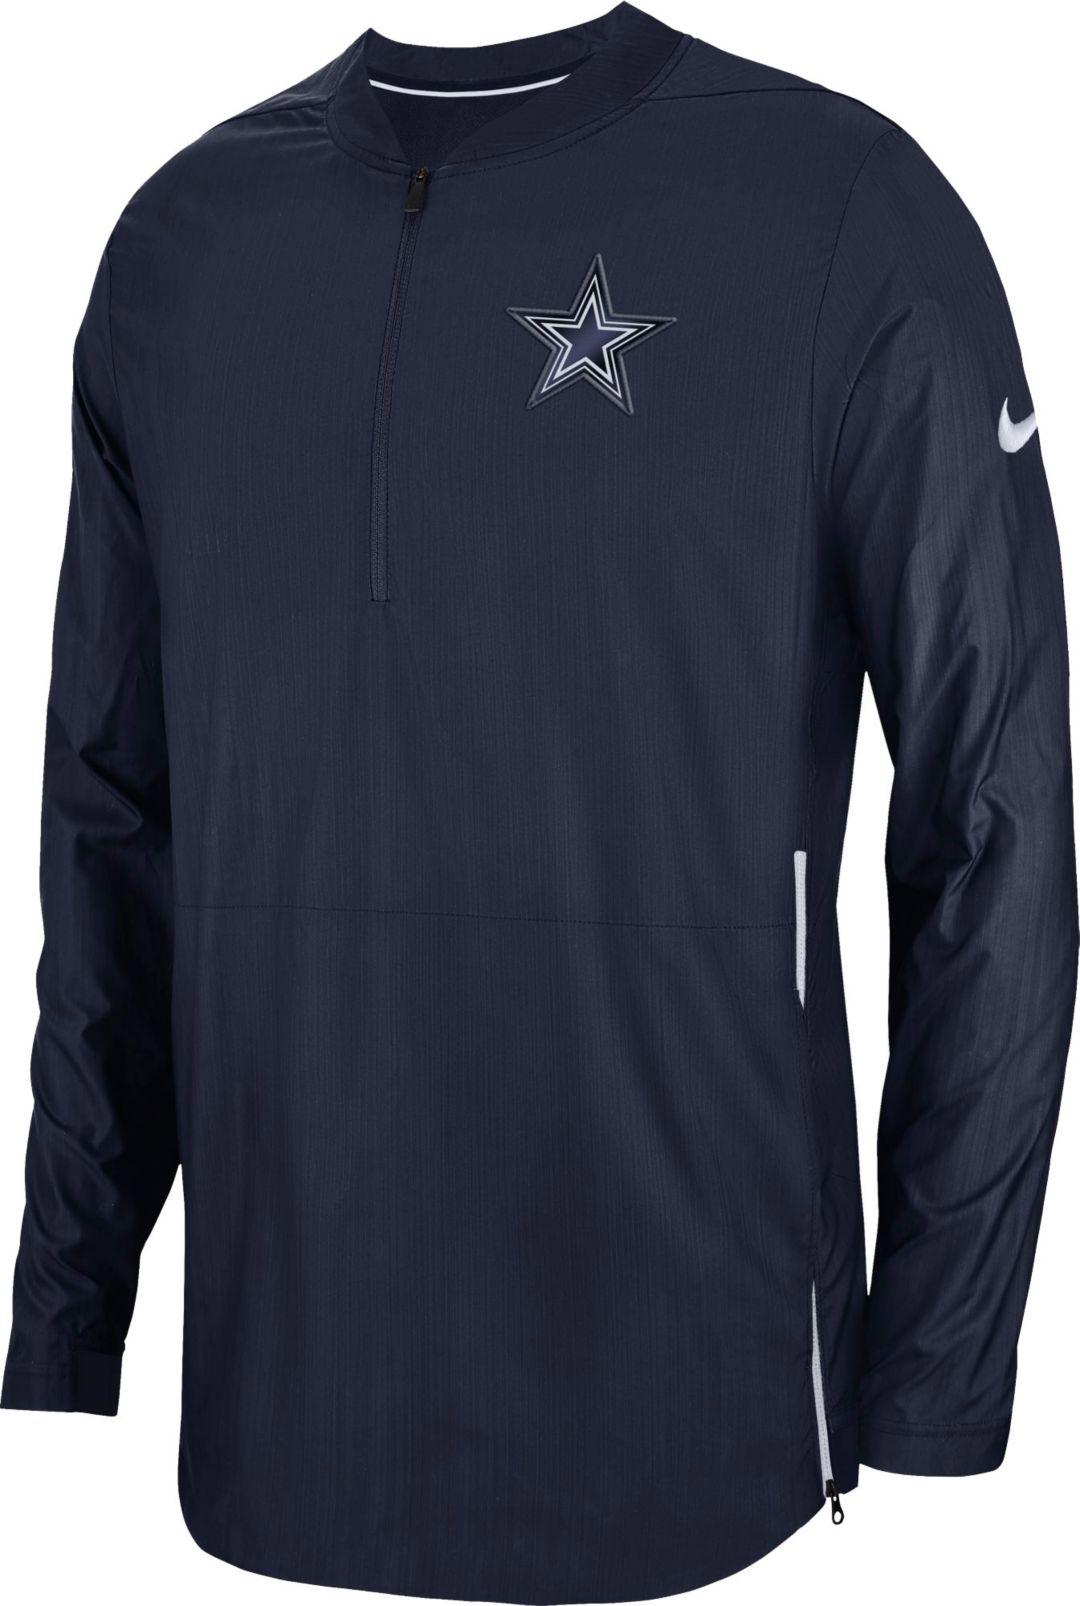 90191d880dc793 Nike Men's Dallas Cowboys Sideline Lockdown Half-Zip Navy Jacket.  noImageFound. 1